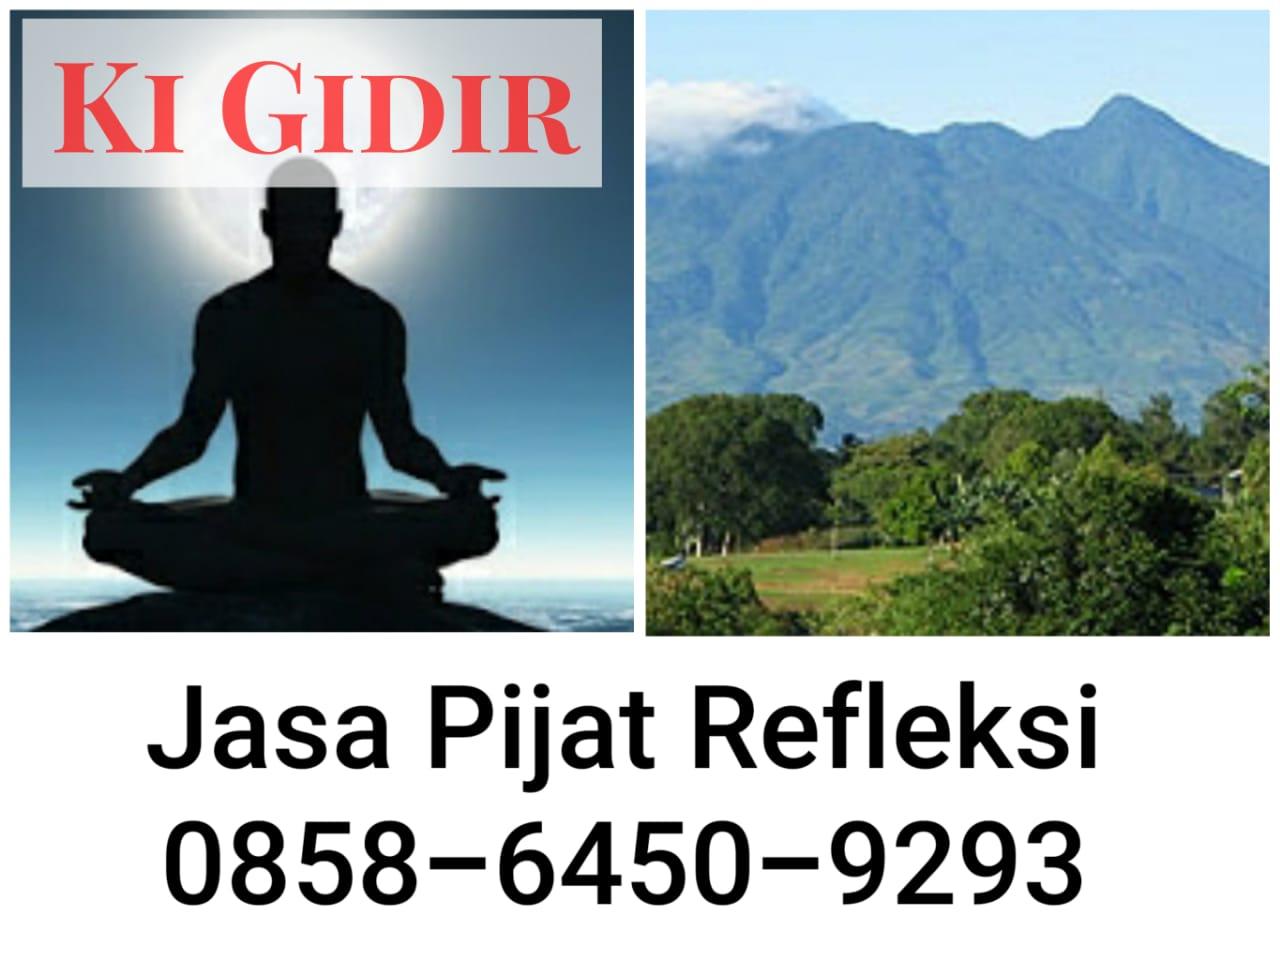 Jasa Pijat Refleksi Tradisional Gunung Salak, Ki Gidir 0858-6450-9293